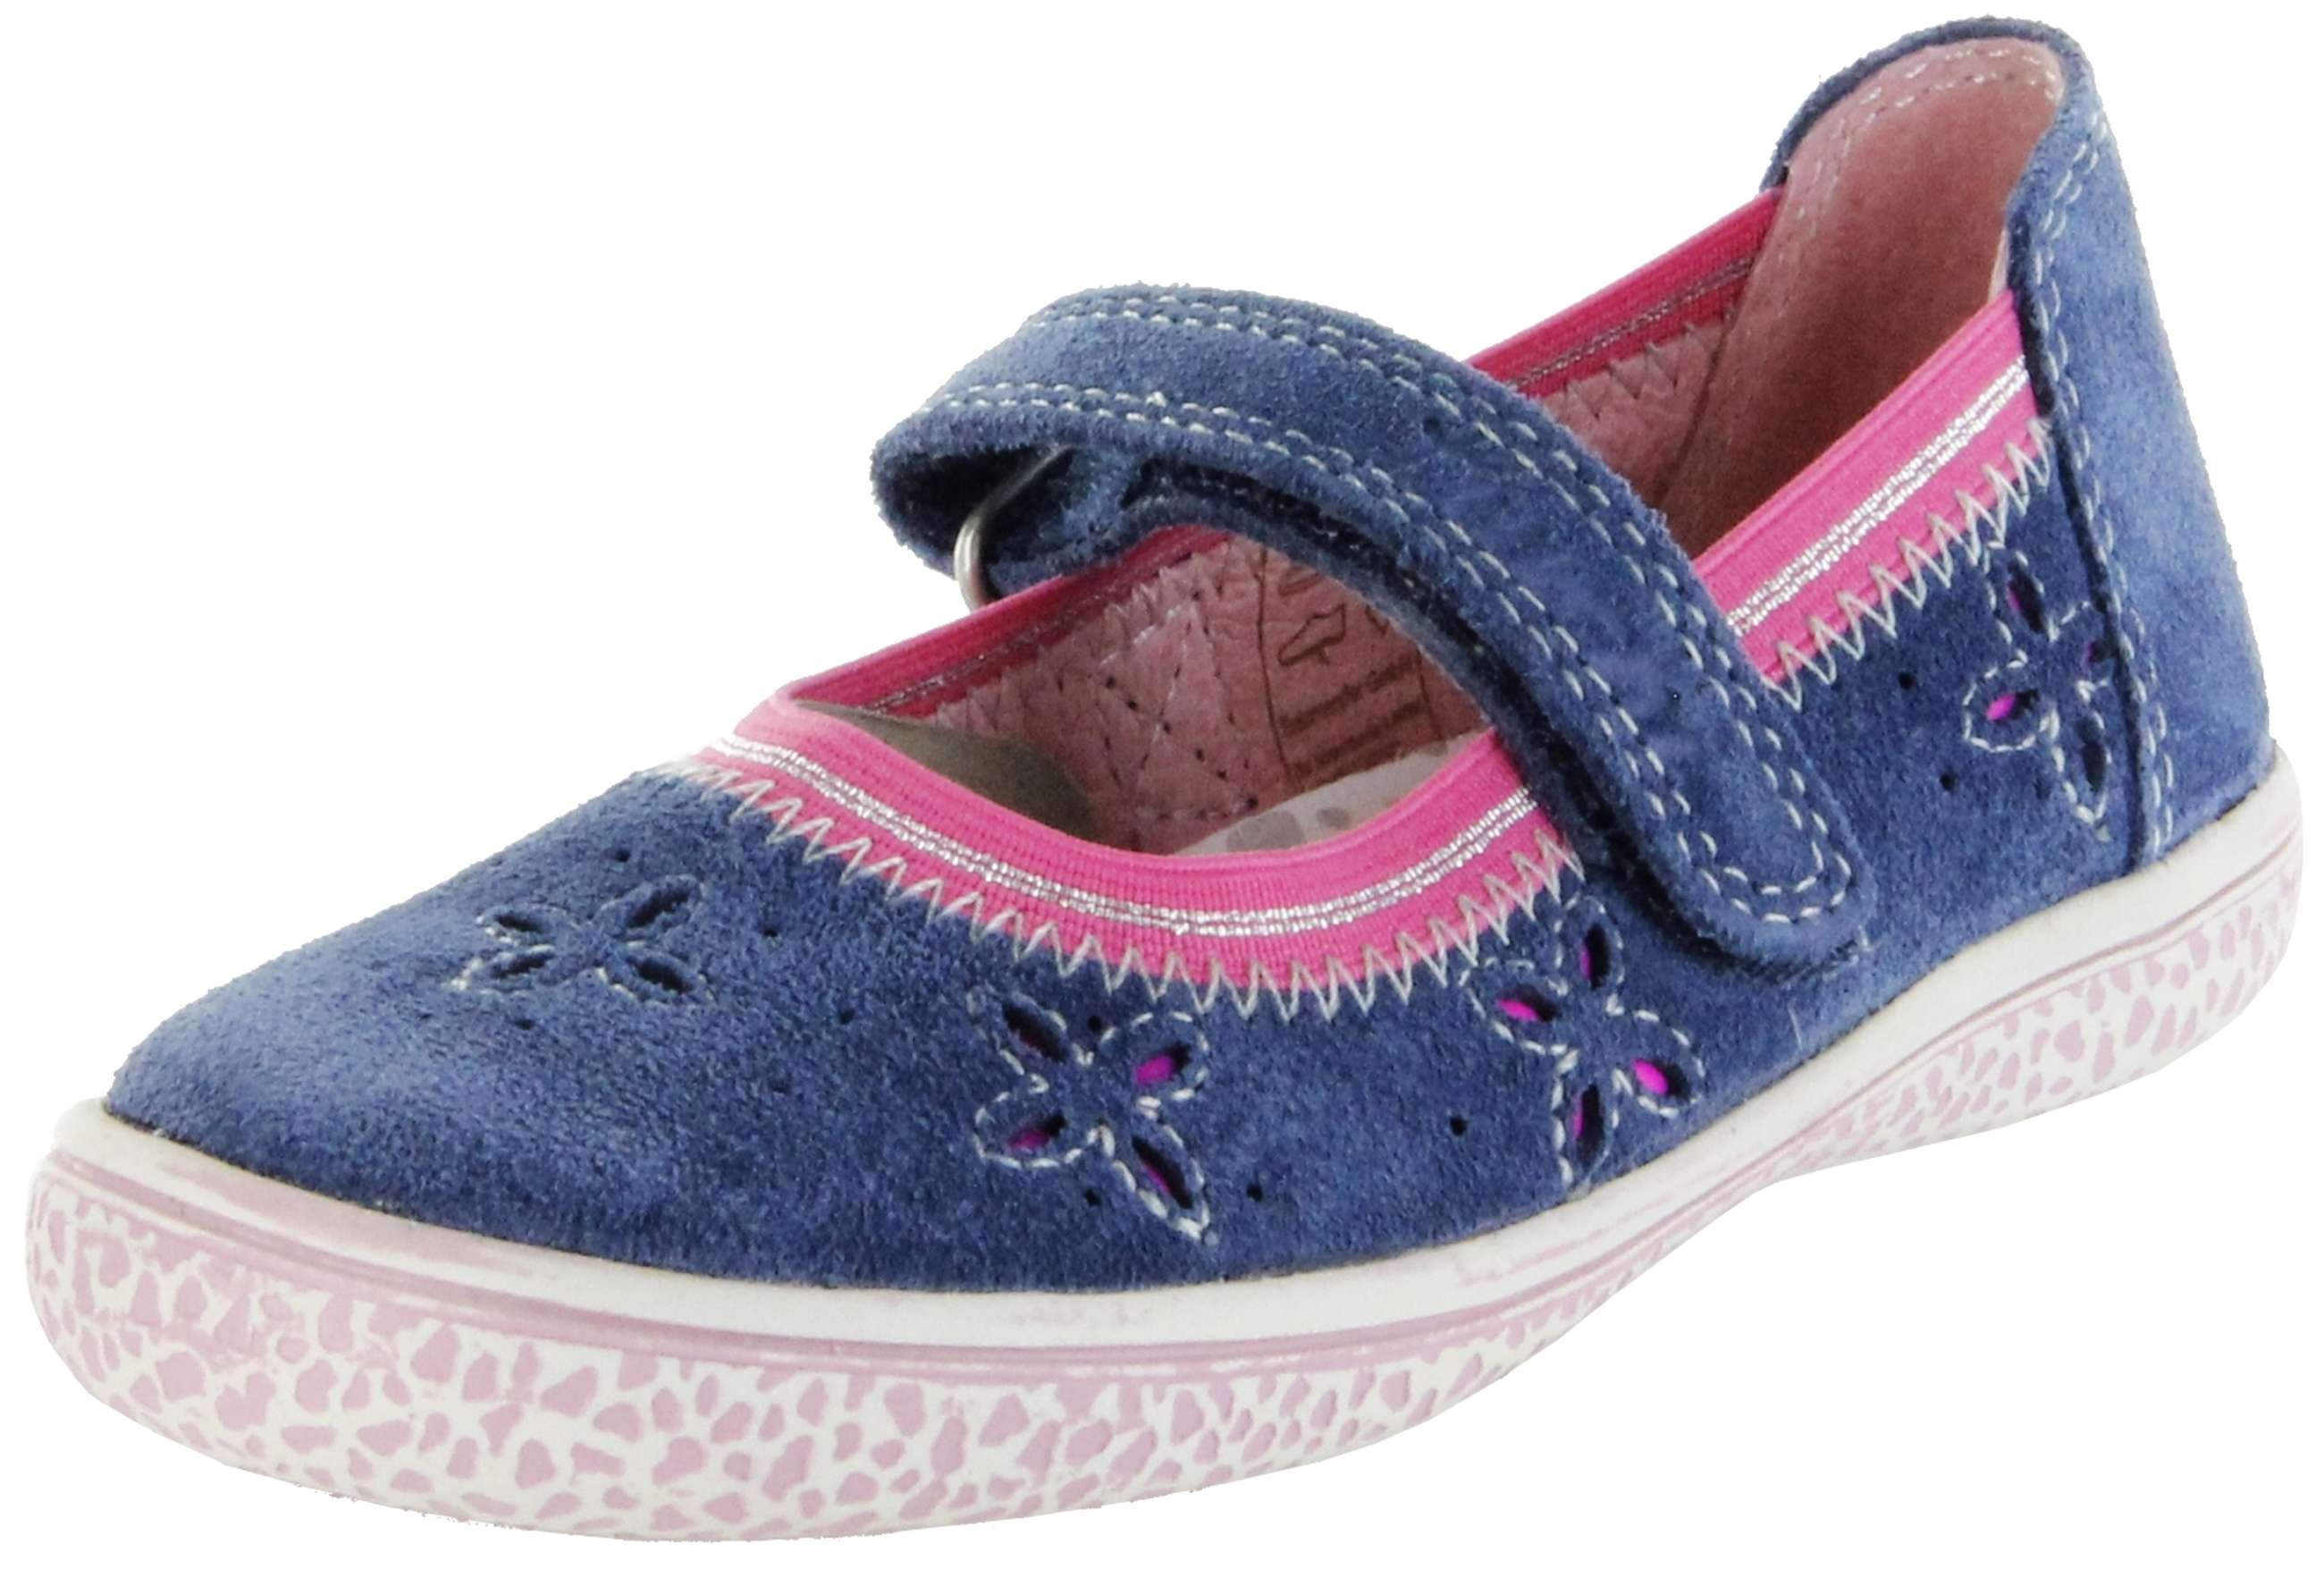 detaillierter Blick f4145 c3f60 Lurchi Kinder Ballerinas blau Velourleder Lederdeck Mädchen Schuhe  33-15286-22 Jeans Tiffi